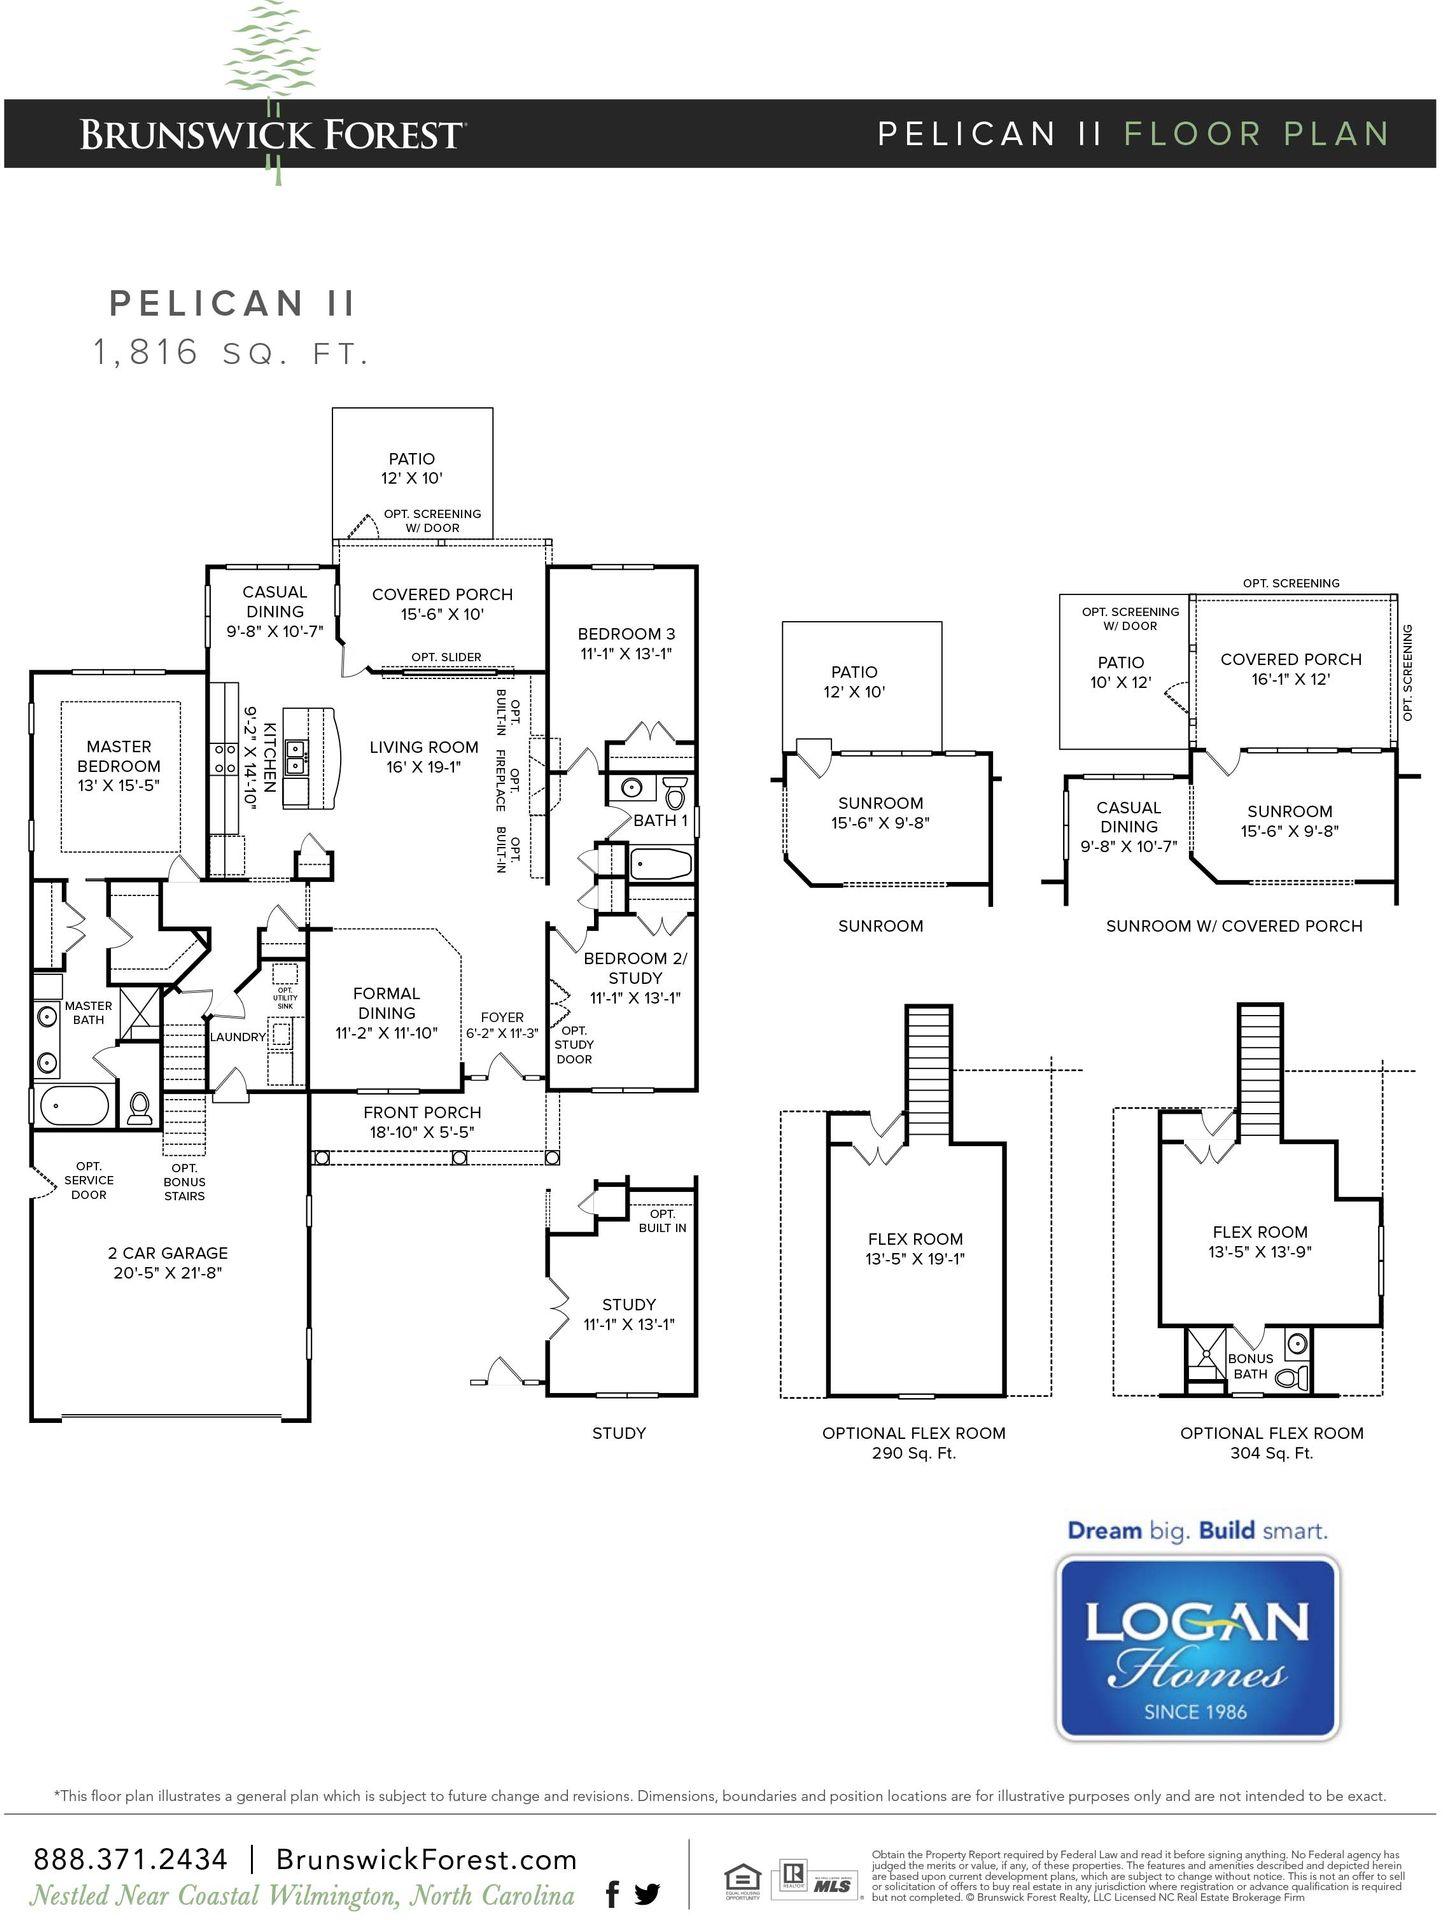 Pelican II Plan, Leland, North Carolina 28451 - Pelican II Plan at ...